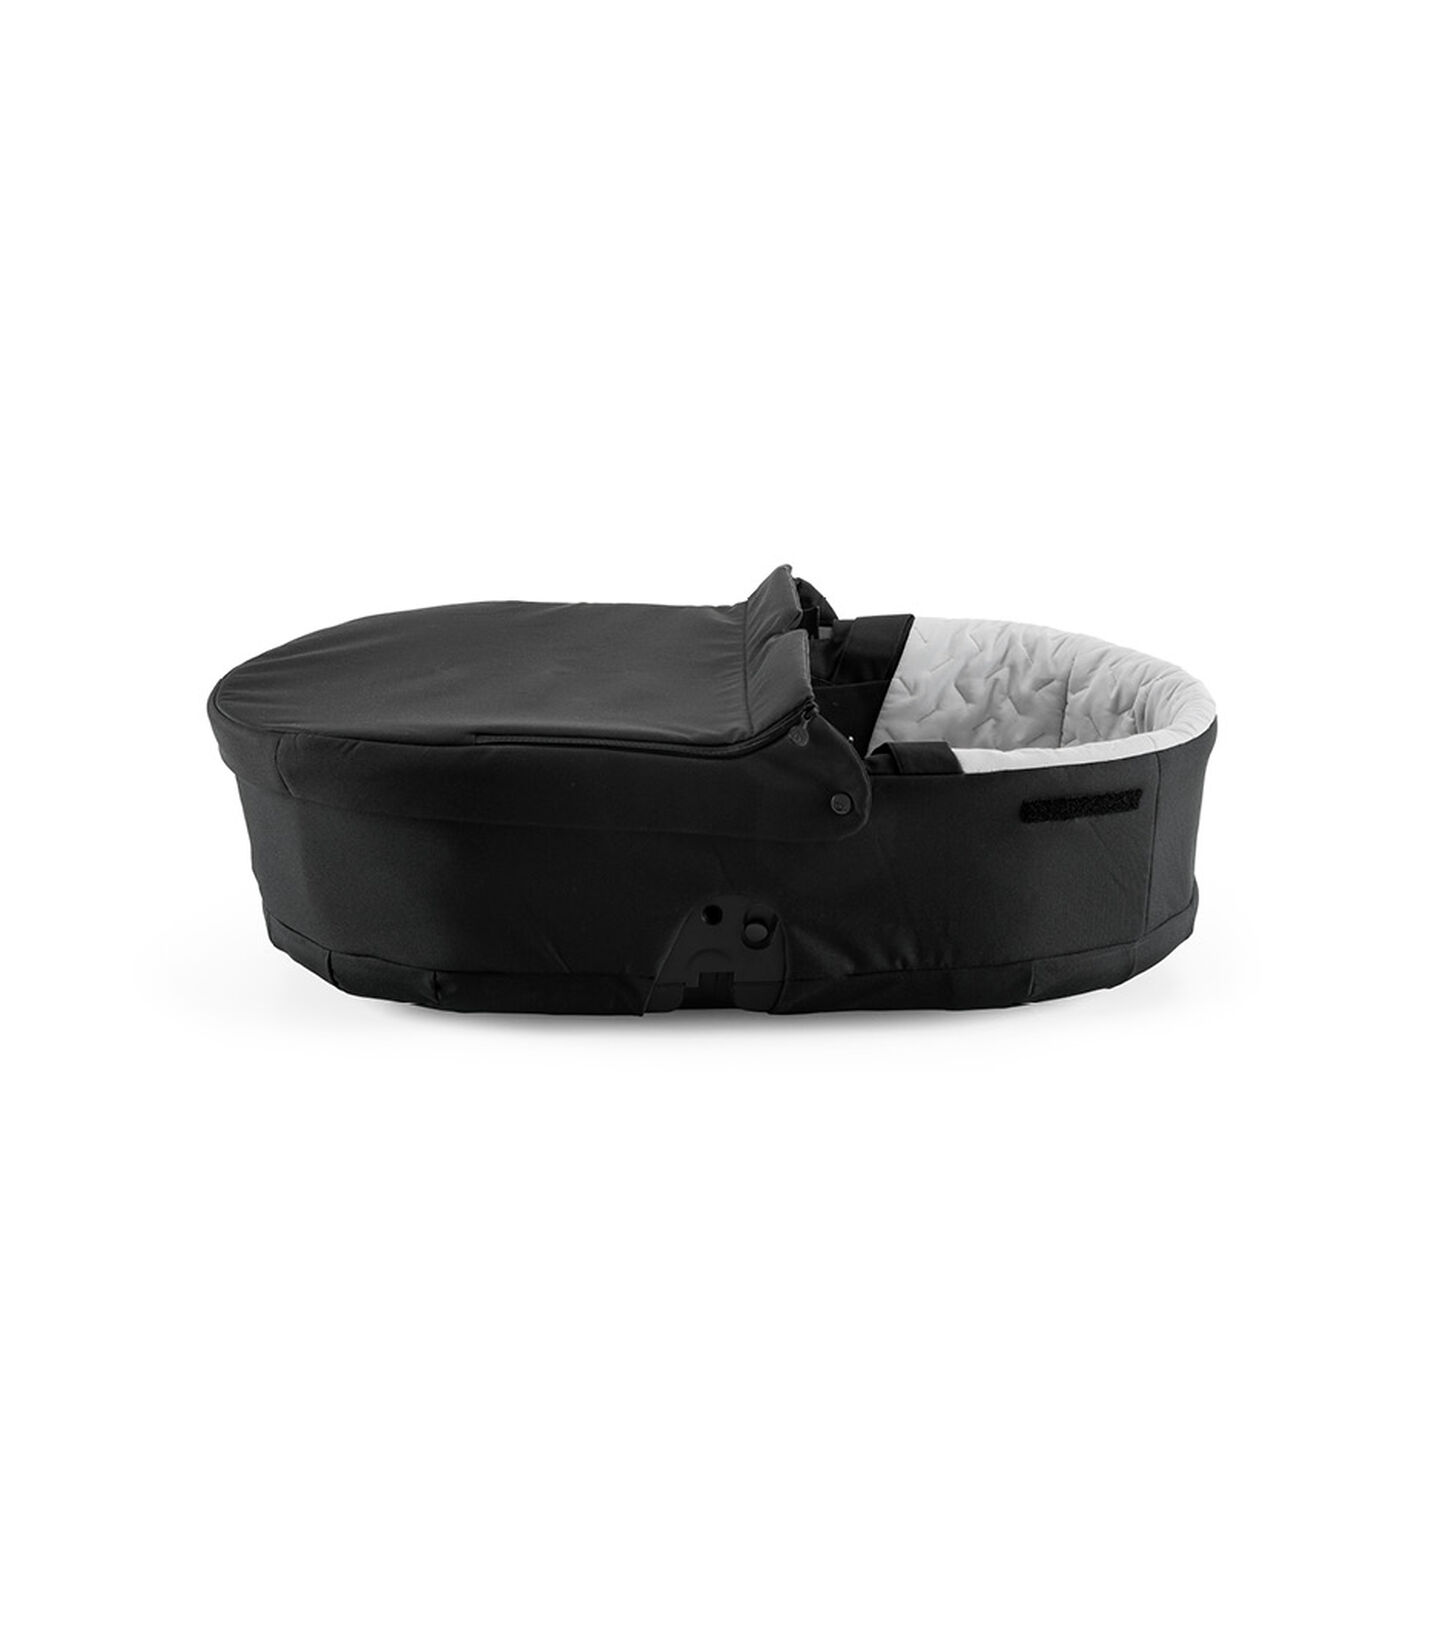 Stokke® Beat Carry Cot Black, Noir, mainview view 2